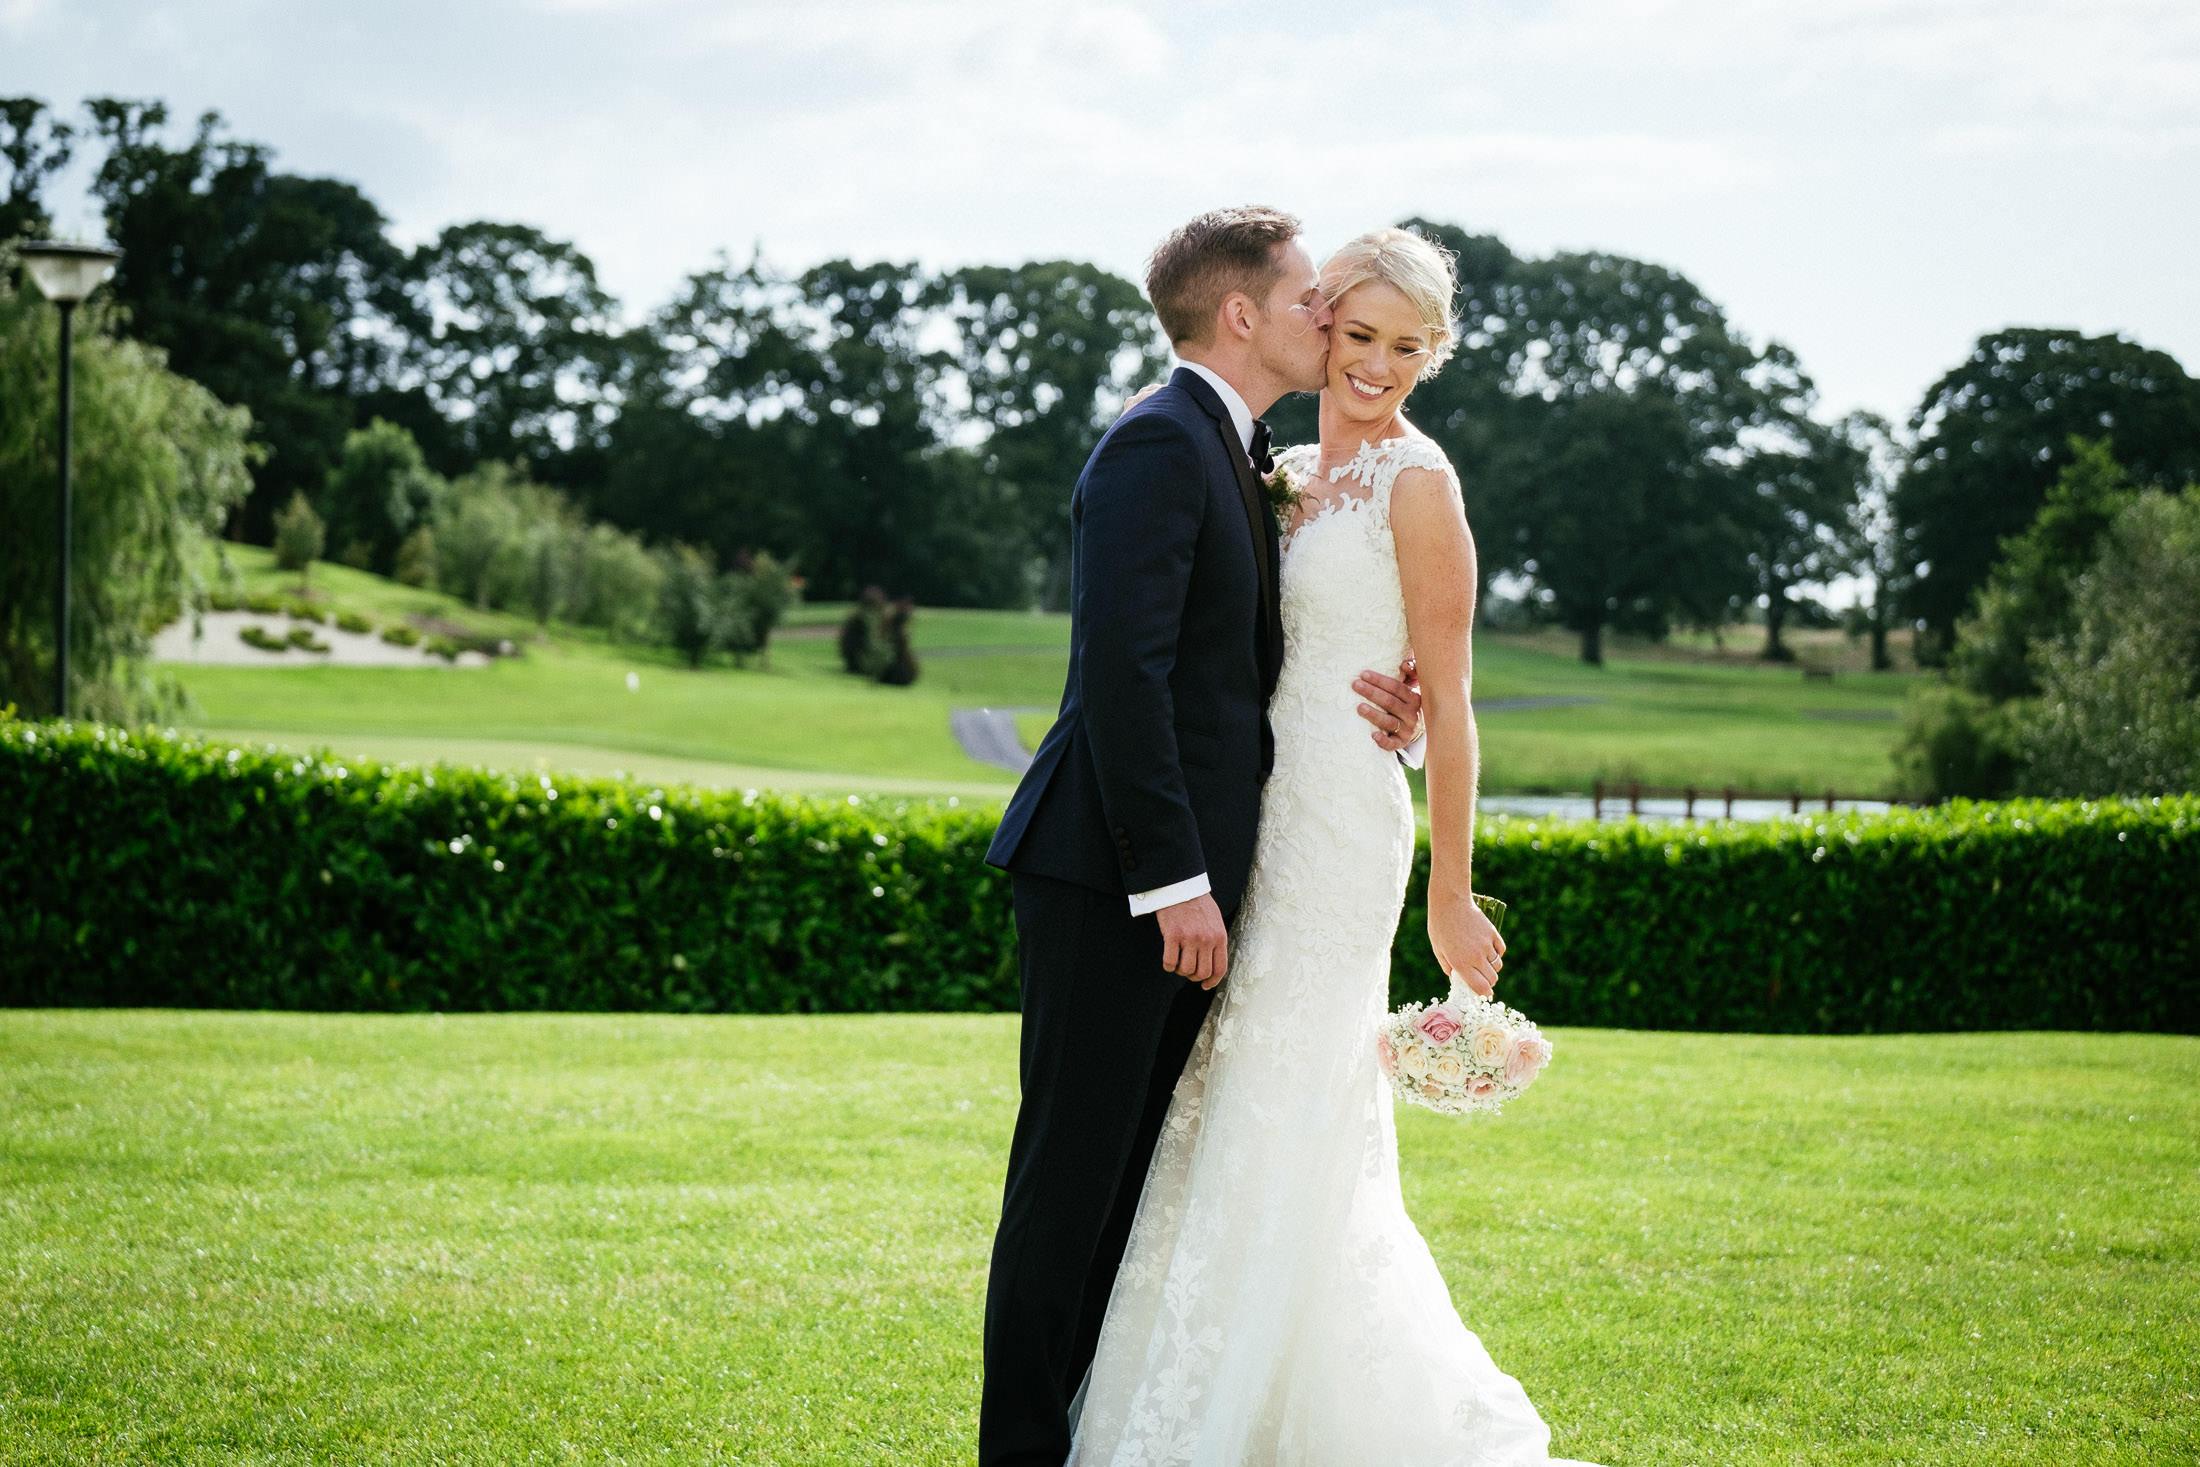 Knightsbrook Hotel Trim Castle Wedding Photographer 90